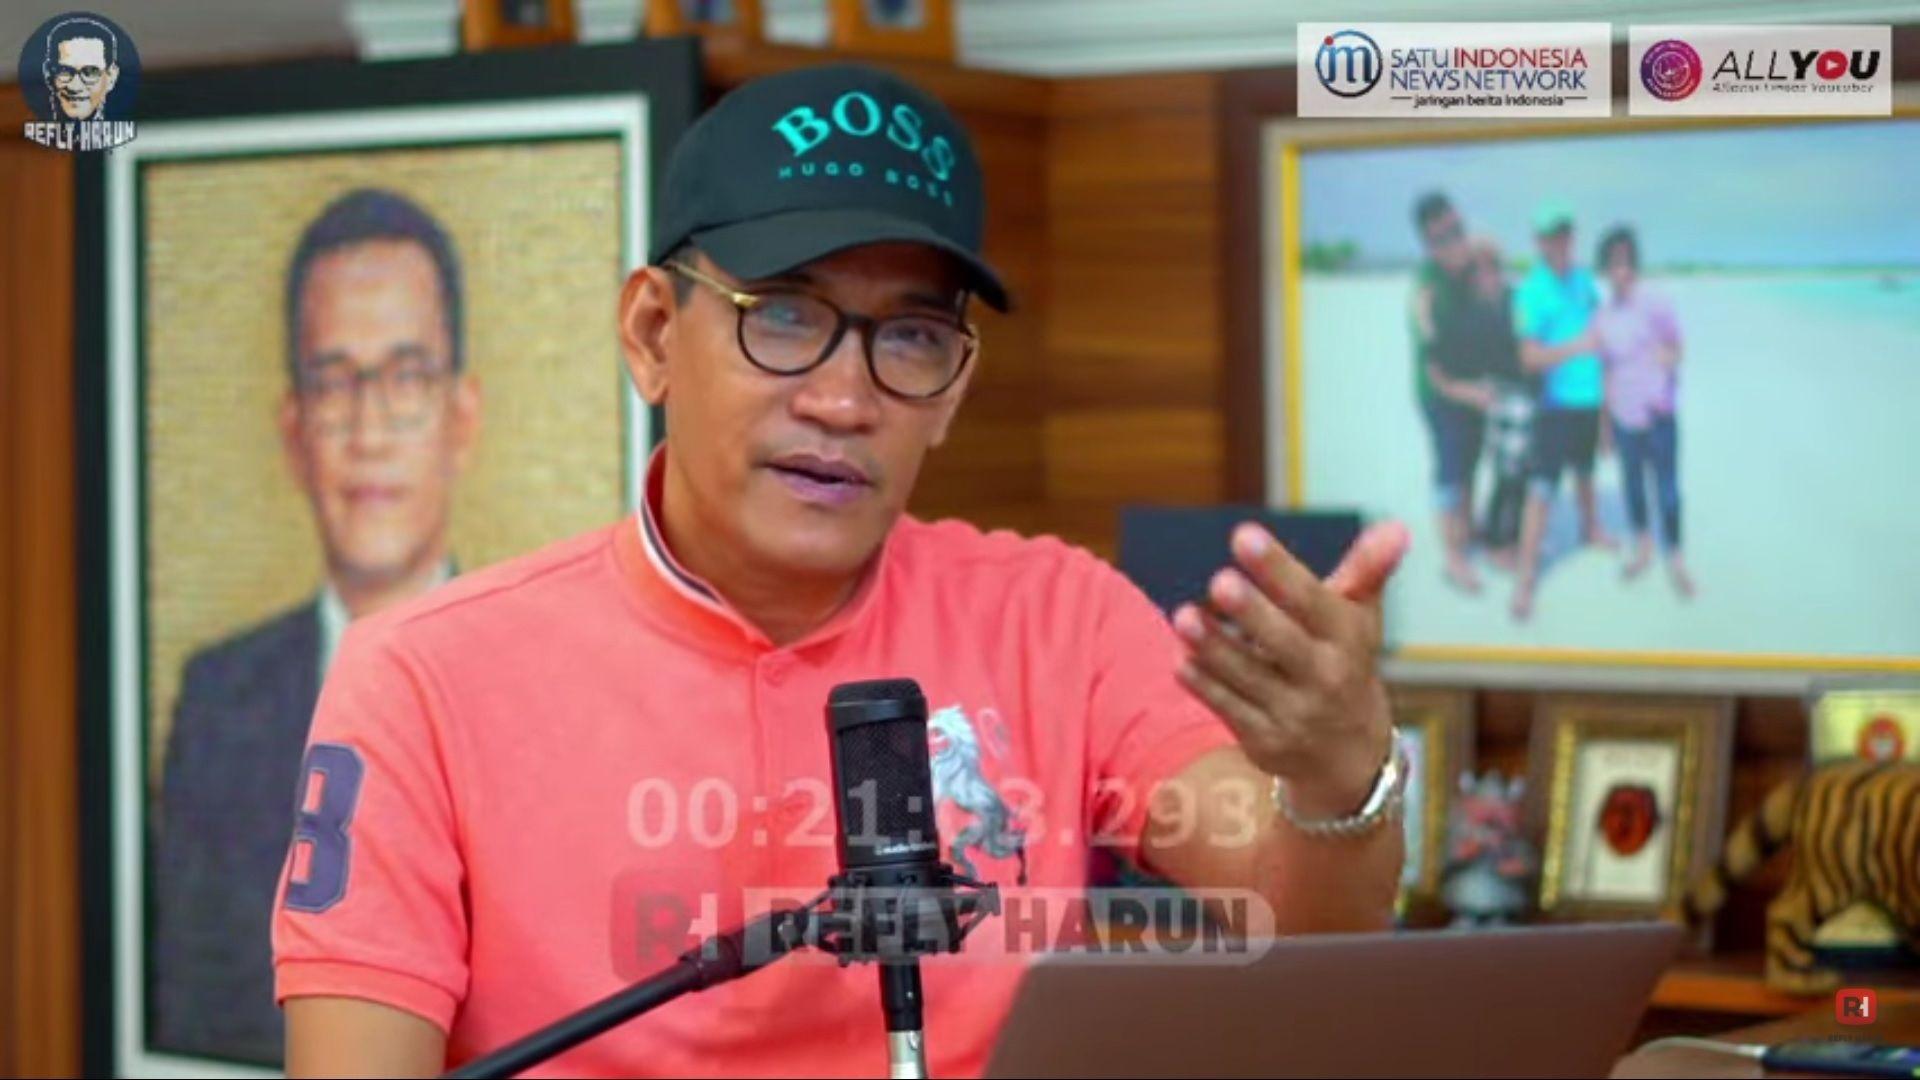 Heran Brigjen Junior Dipecat Gegara Bela Rakyat, Refly Harun: Letjen Dudung Perangi Warga Sipil Malah Dapat Promosi